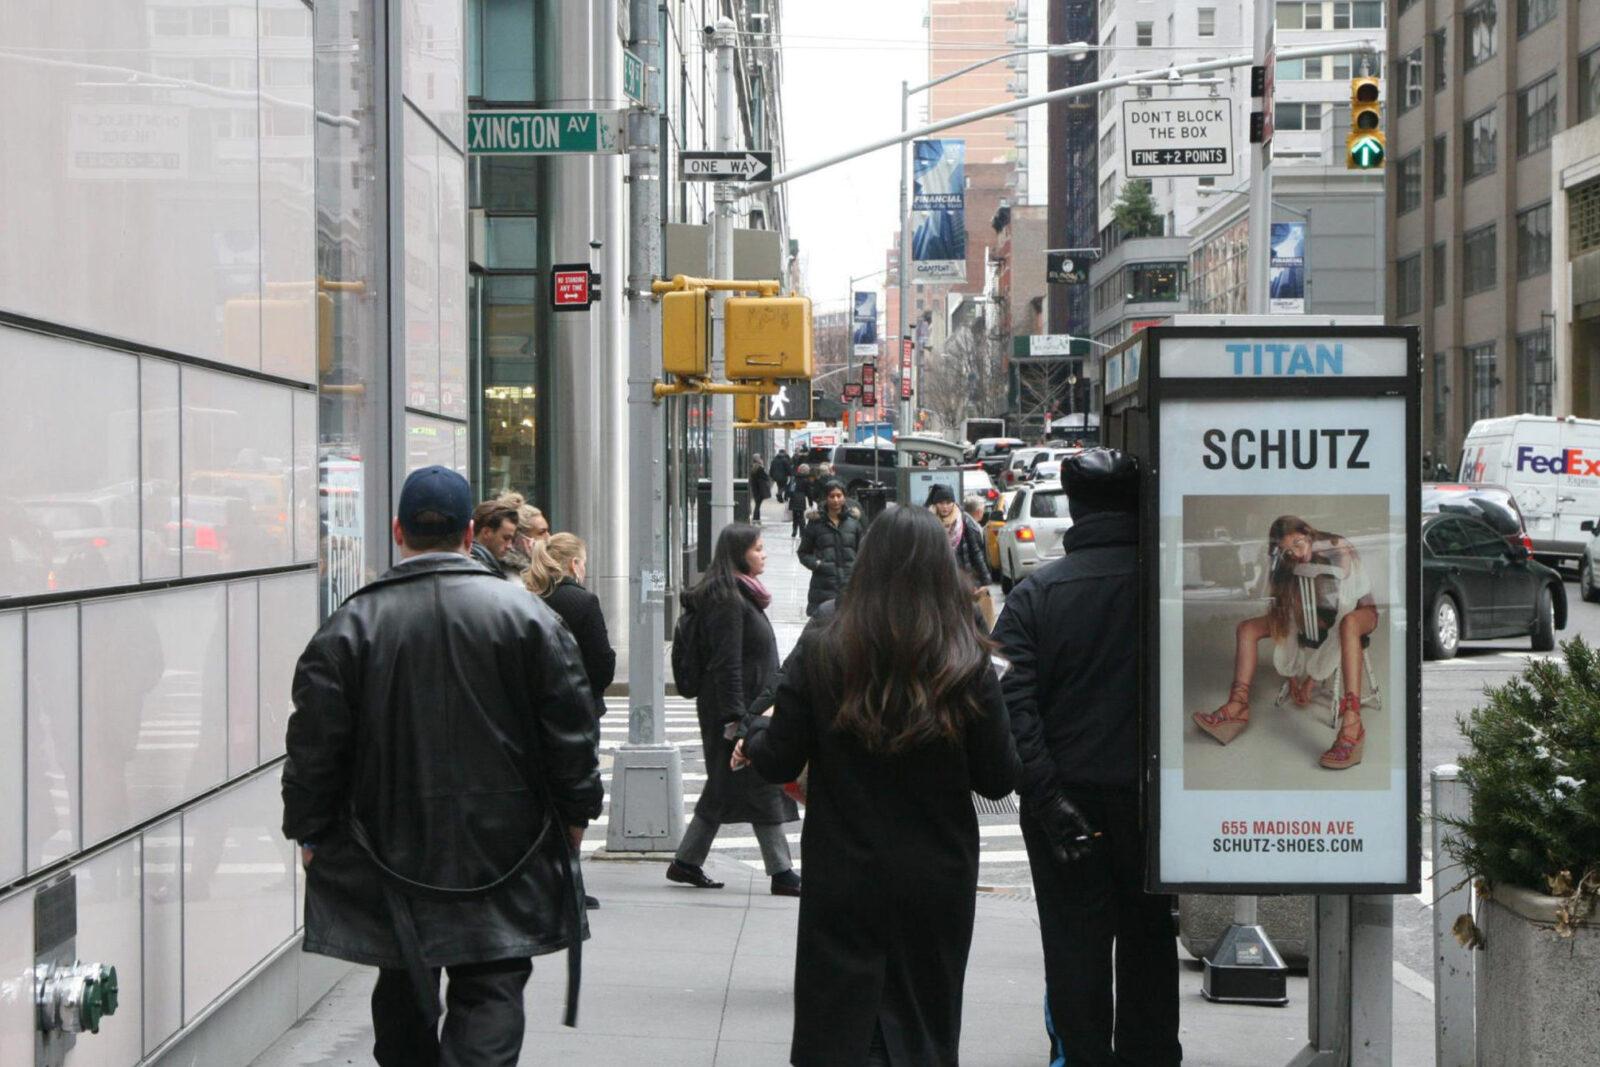 Schutz Shoes NYC Street Furniture Phone Kiosk Advertising